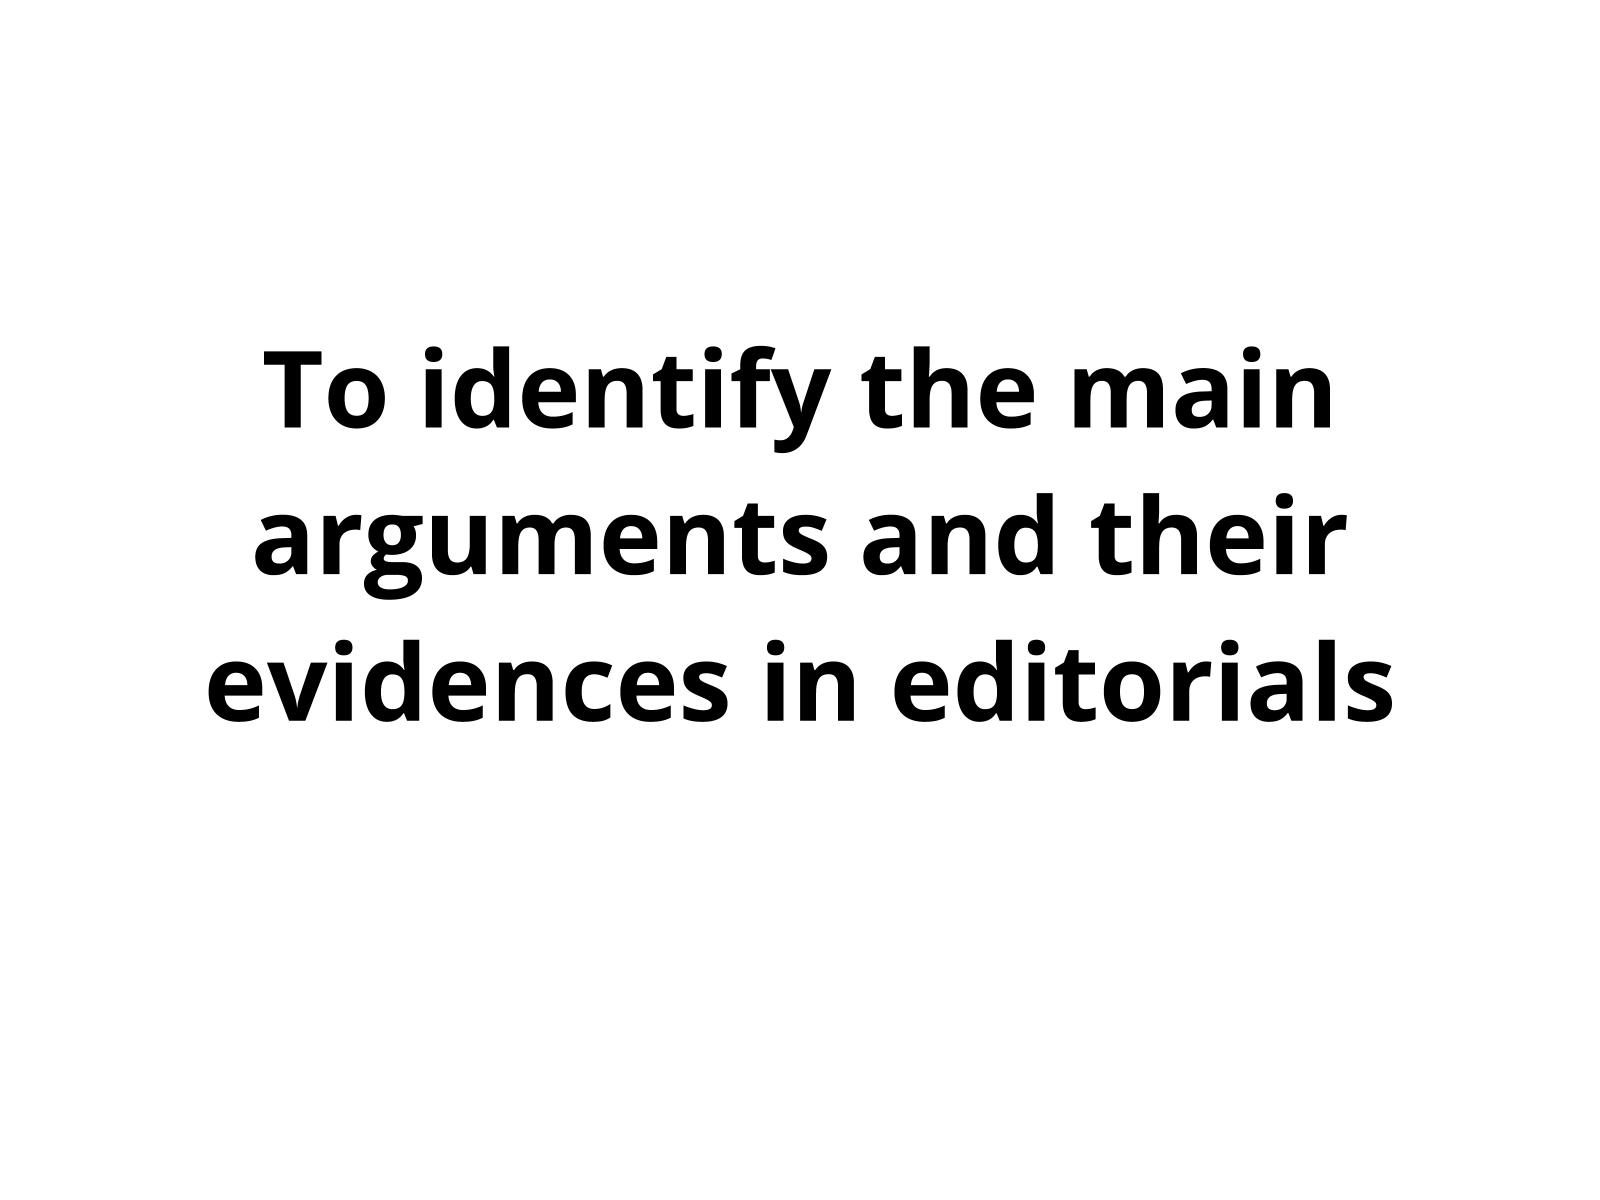 Editorial - Identificar argumentos